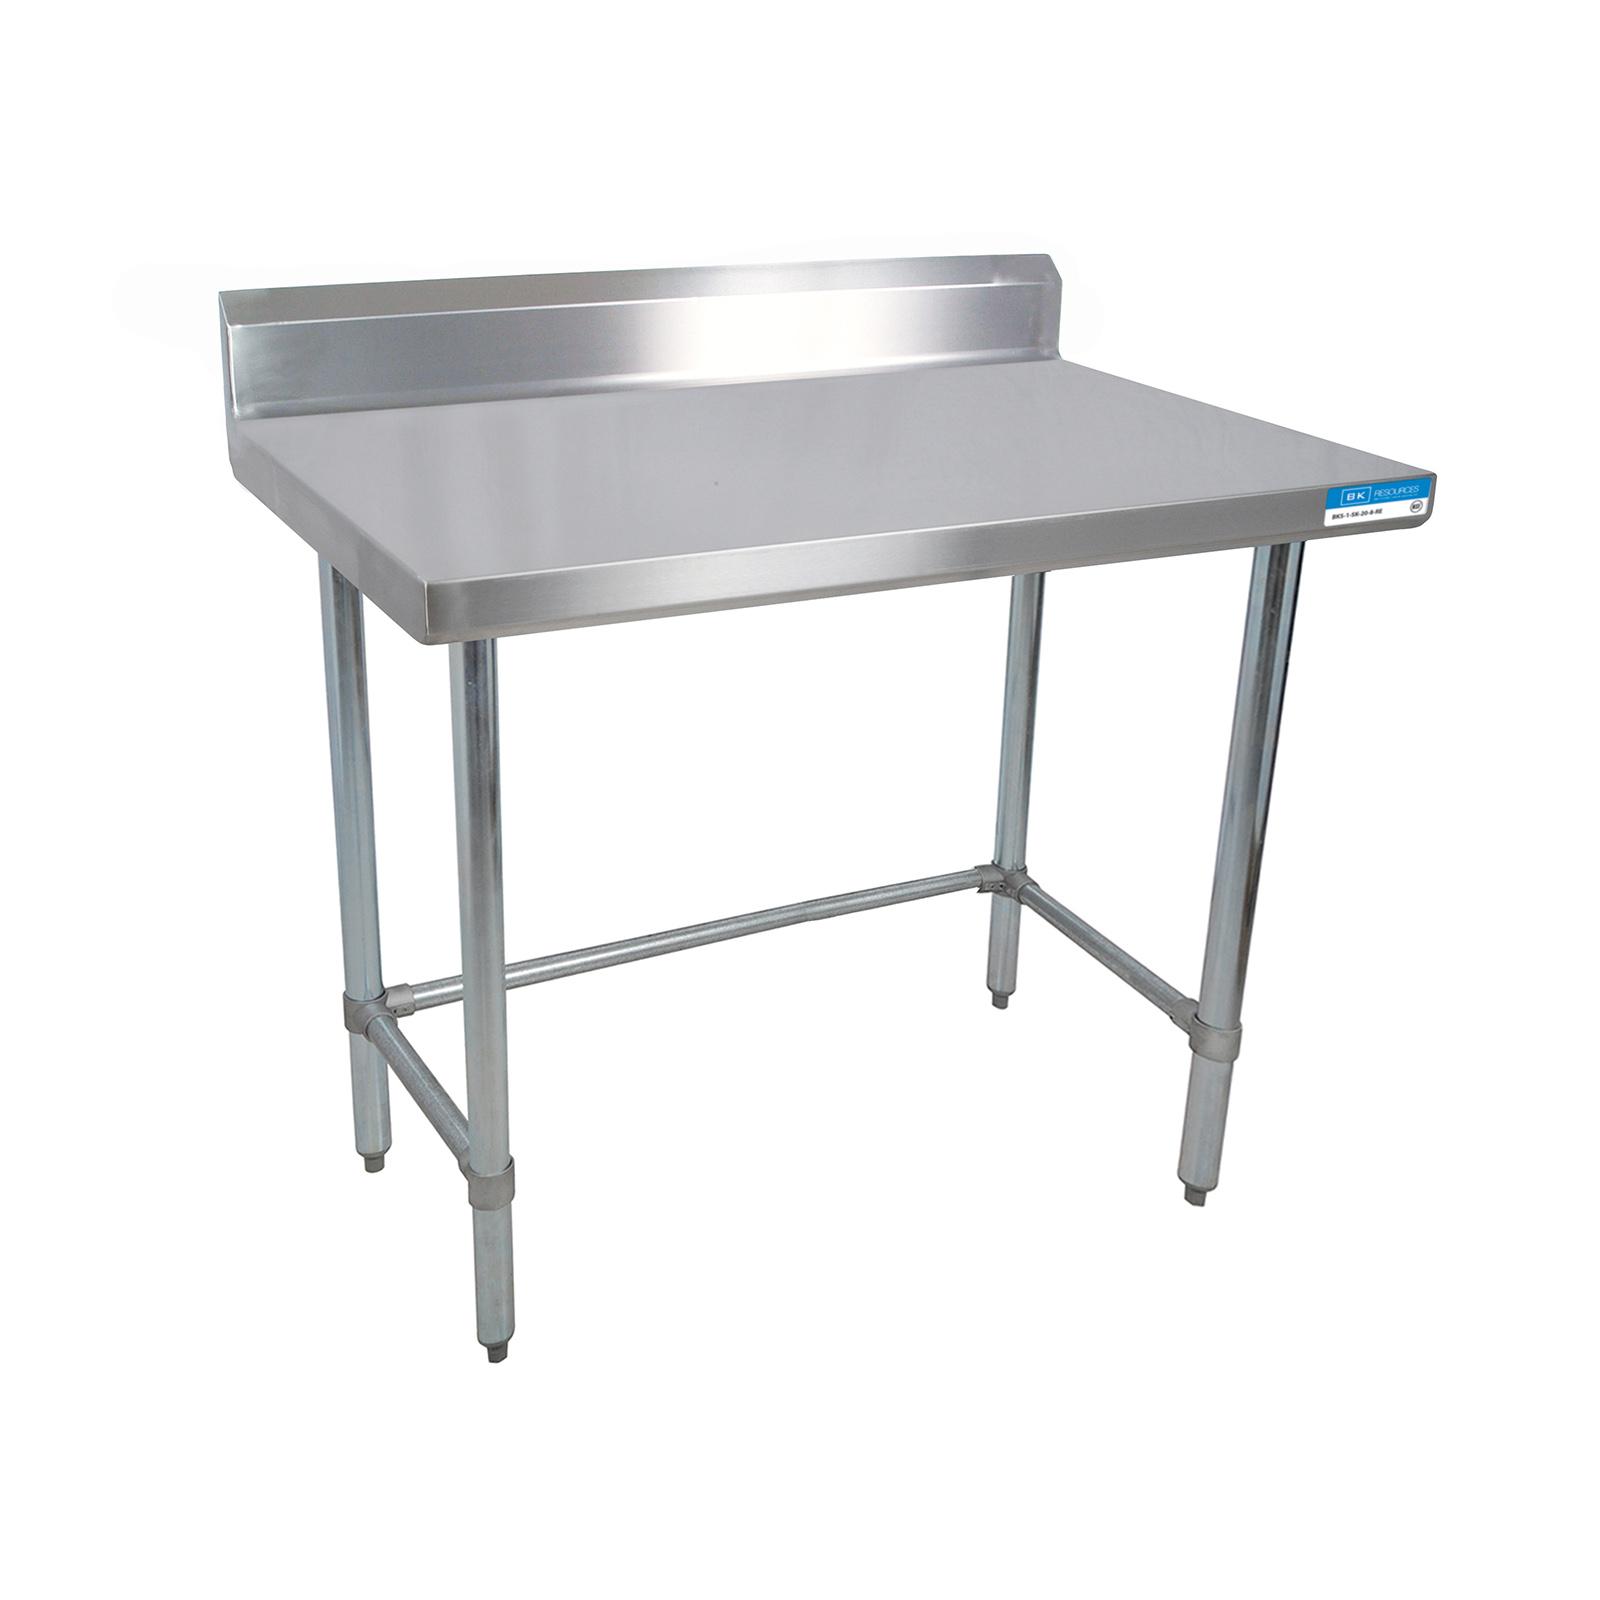 BK Resources SVTR5OB-7224 work table,  63